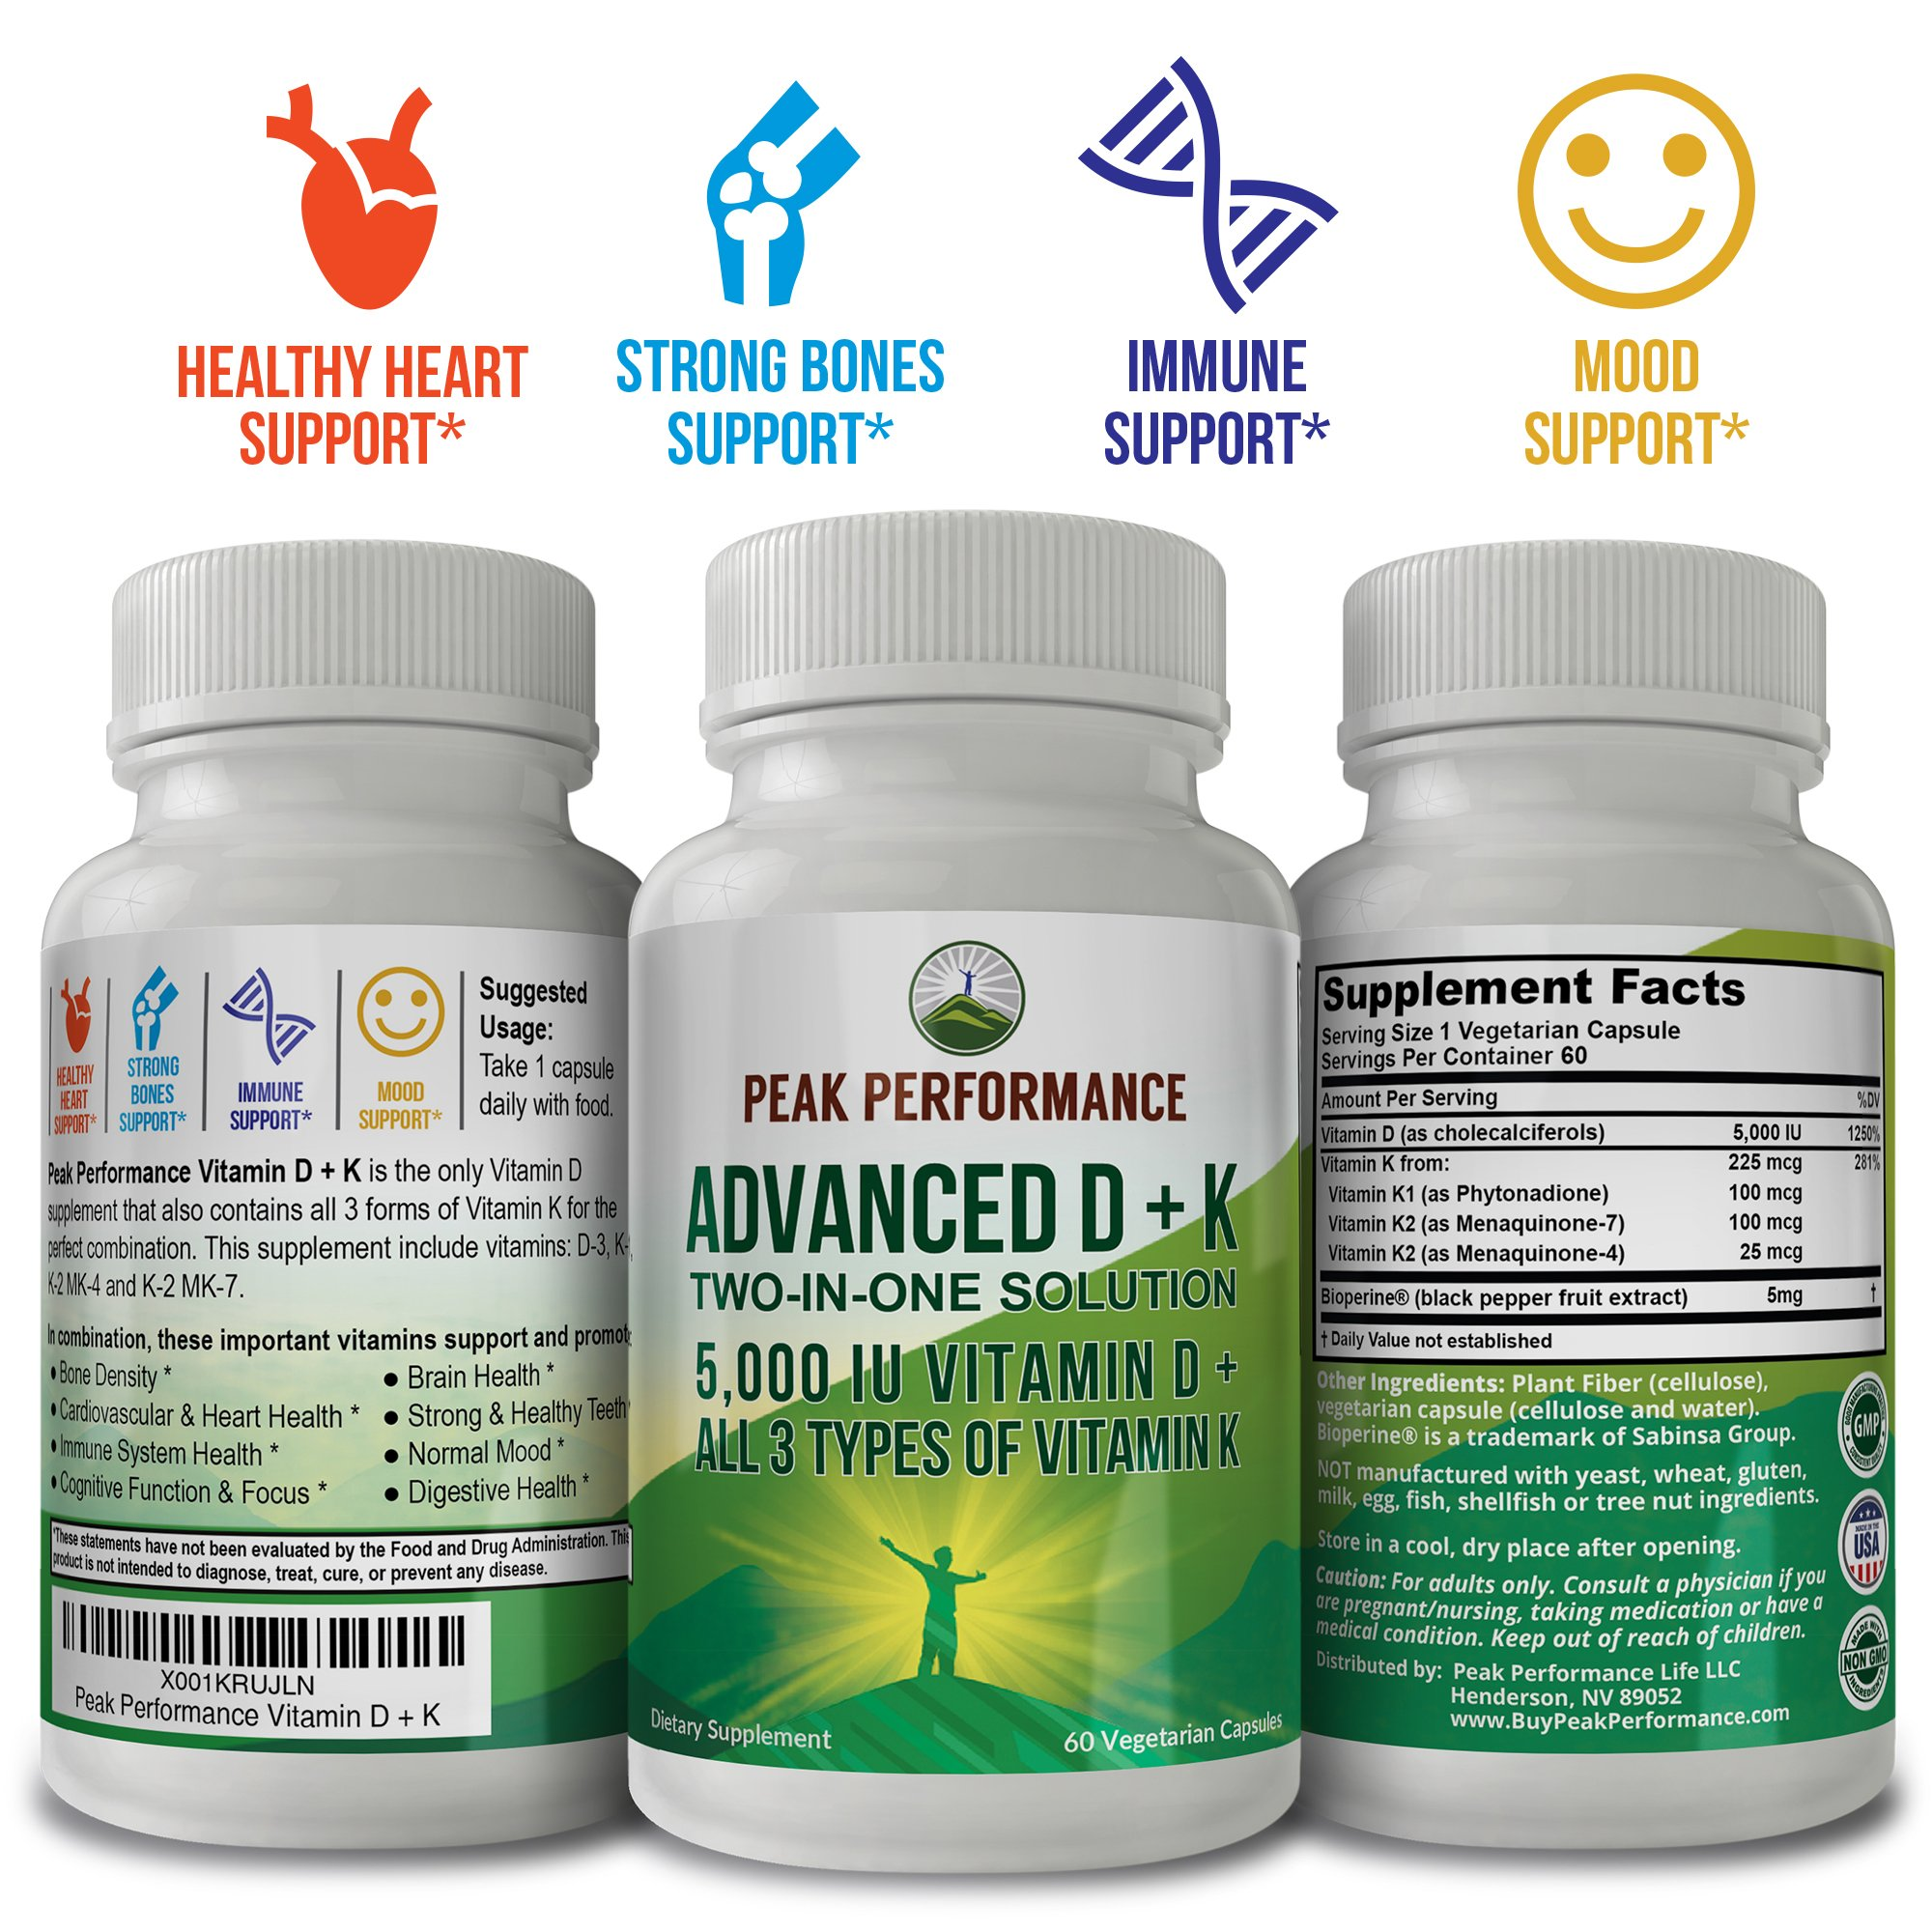 ADVANCED Vitamin D 5000 IU + ALL 3 Types Of Vitamin K By Peak Performance. Vitamin D3 and Vitamin K2 MK-7 (MK7) K2 MK4 K1 Supplement! 60 Small & Easy to Swallow Vegetable Capsules / Pills (5000 IU) by Peak Performance Coffee (Image #2)